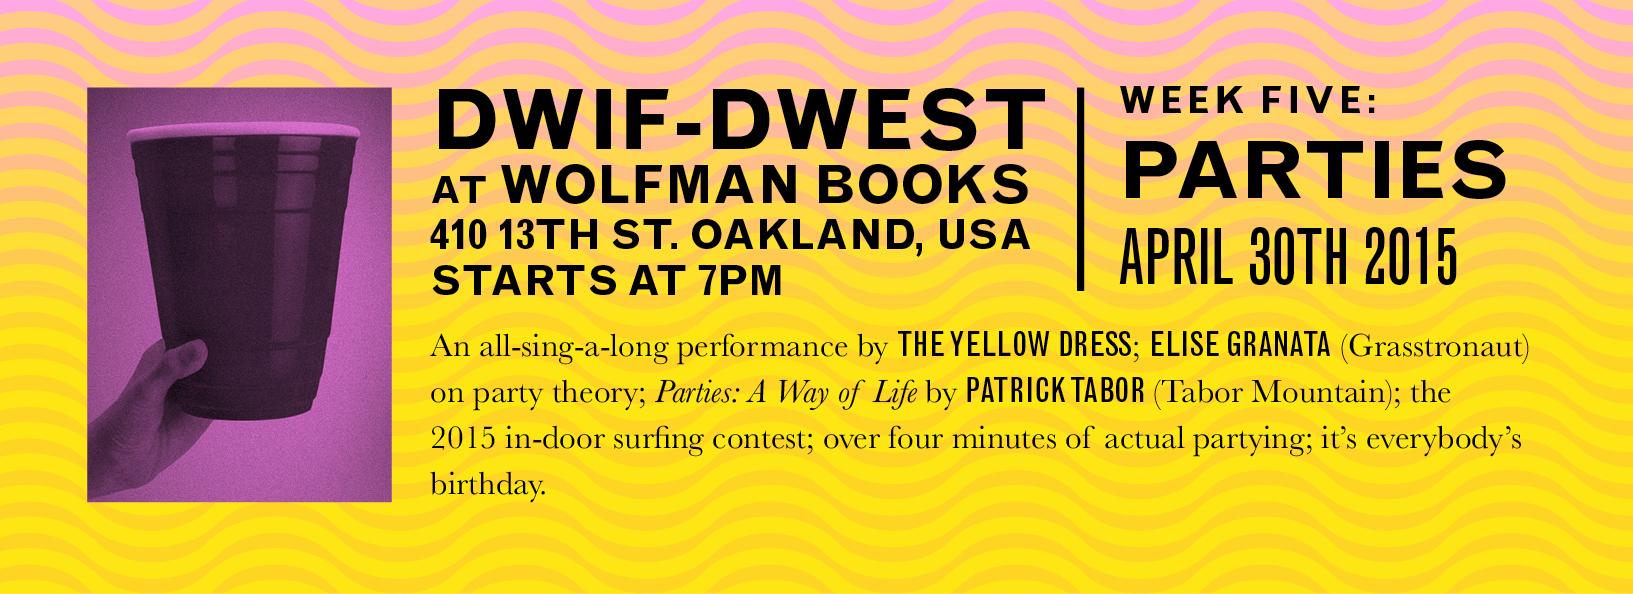 dwif_parties_new.jpg